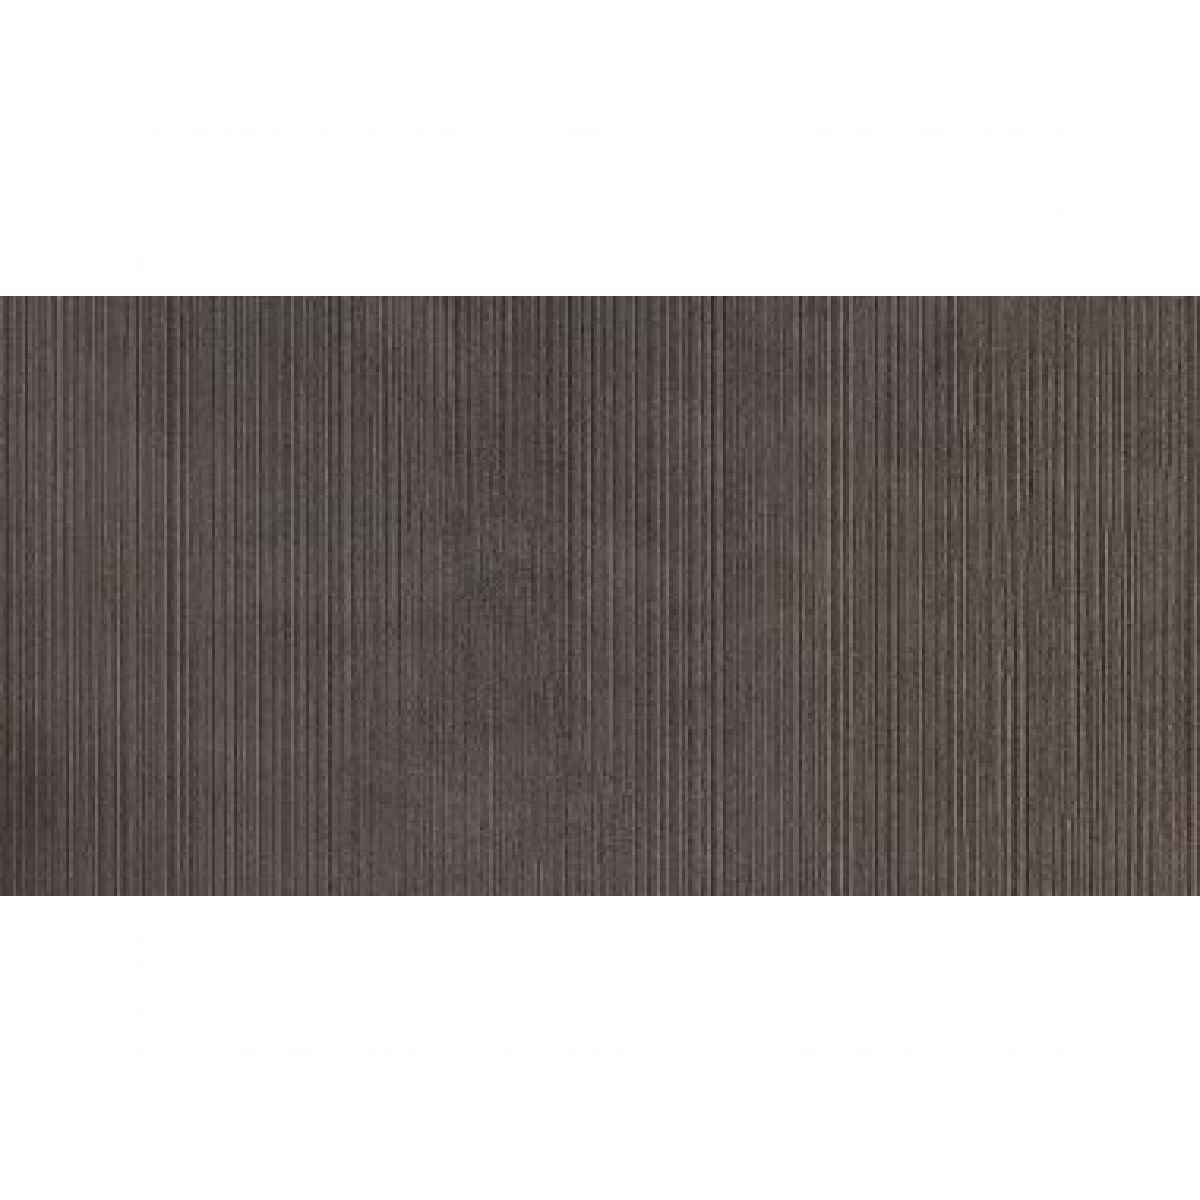 RAK Surface Dark Greige Rustic Tile 300 x 600mm